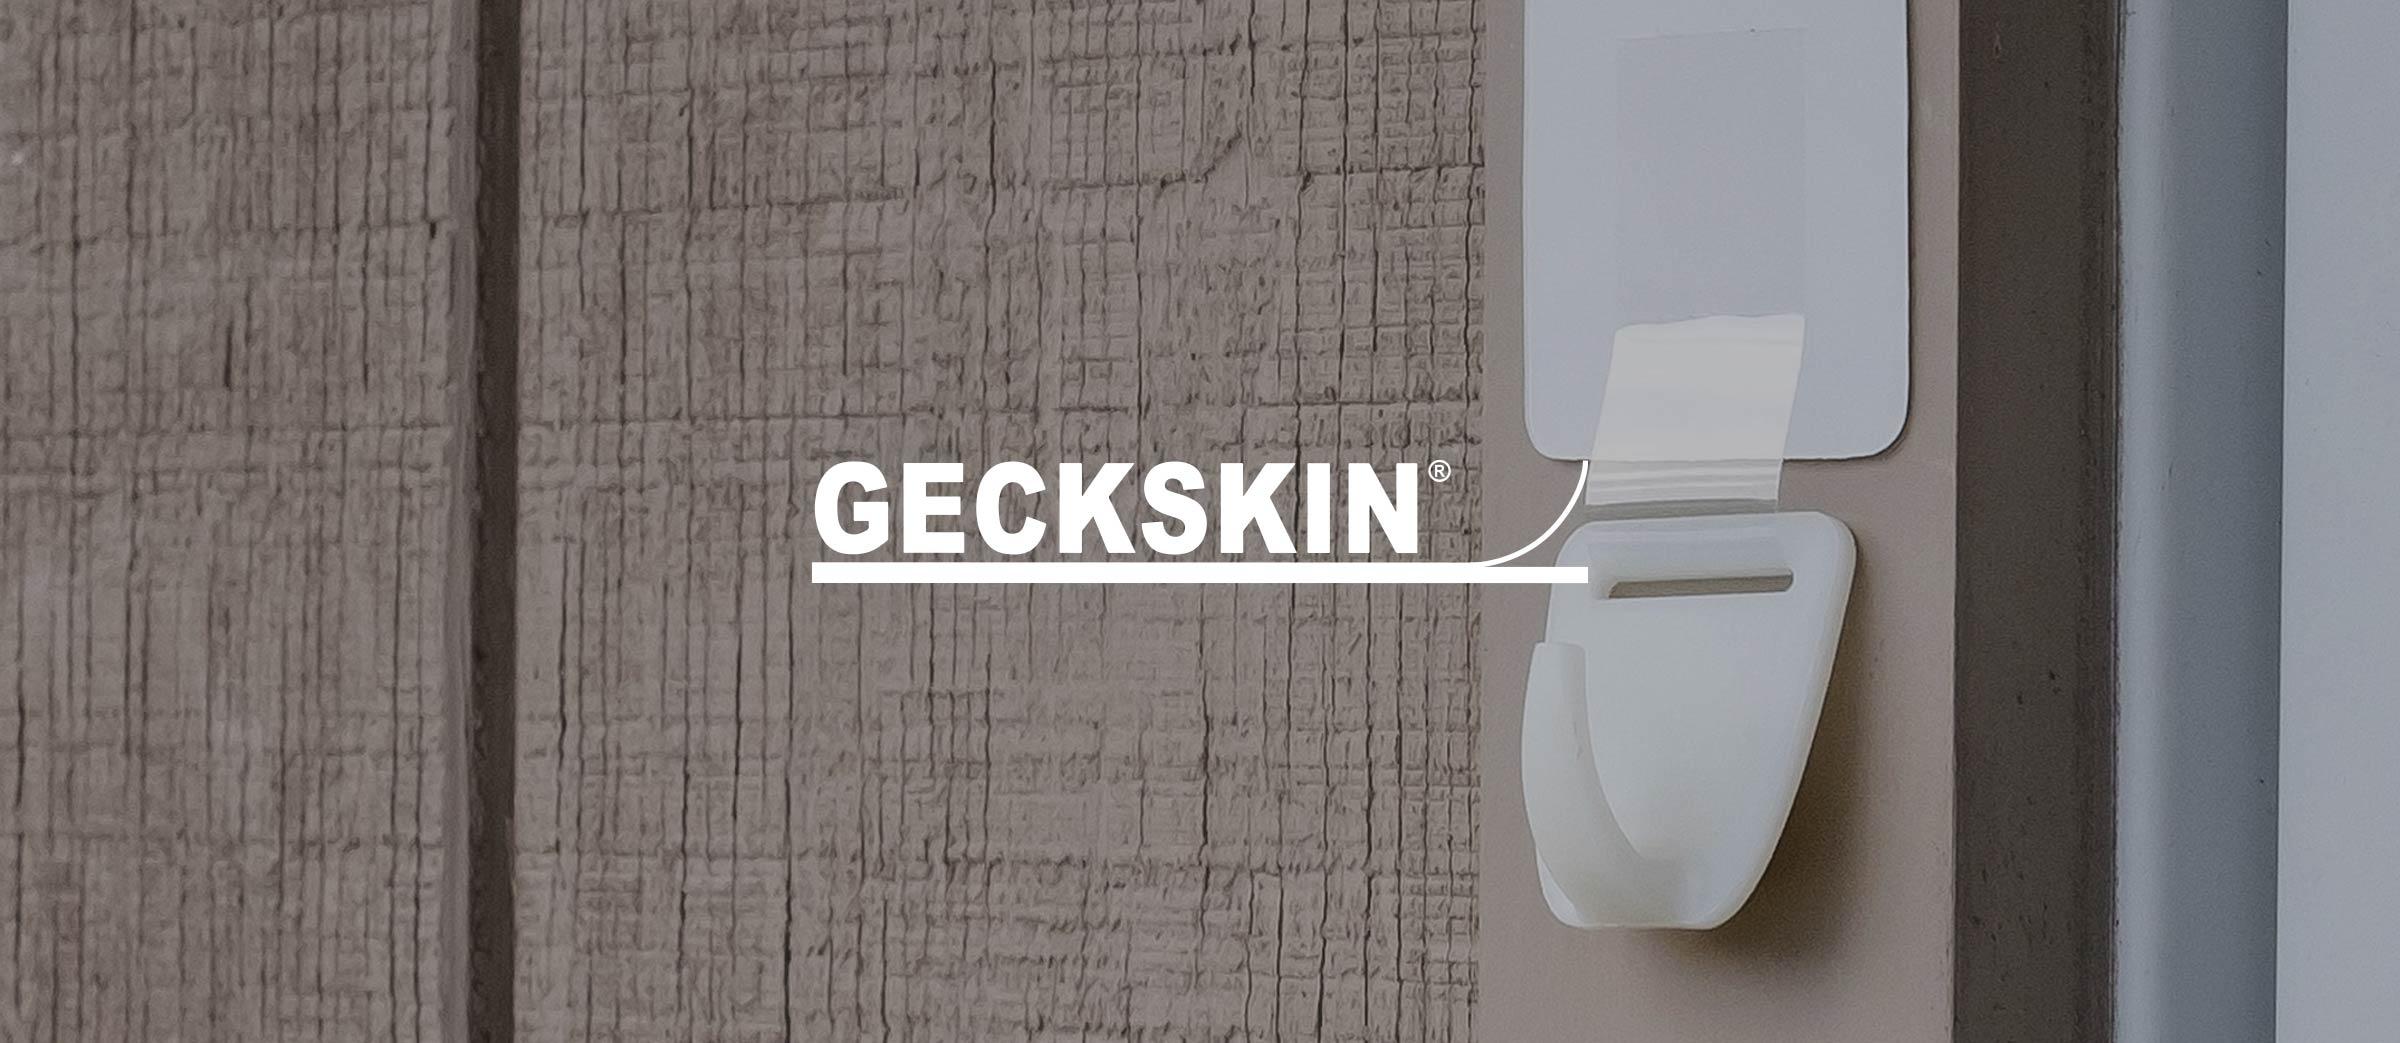 Geckskin Product Image